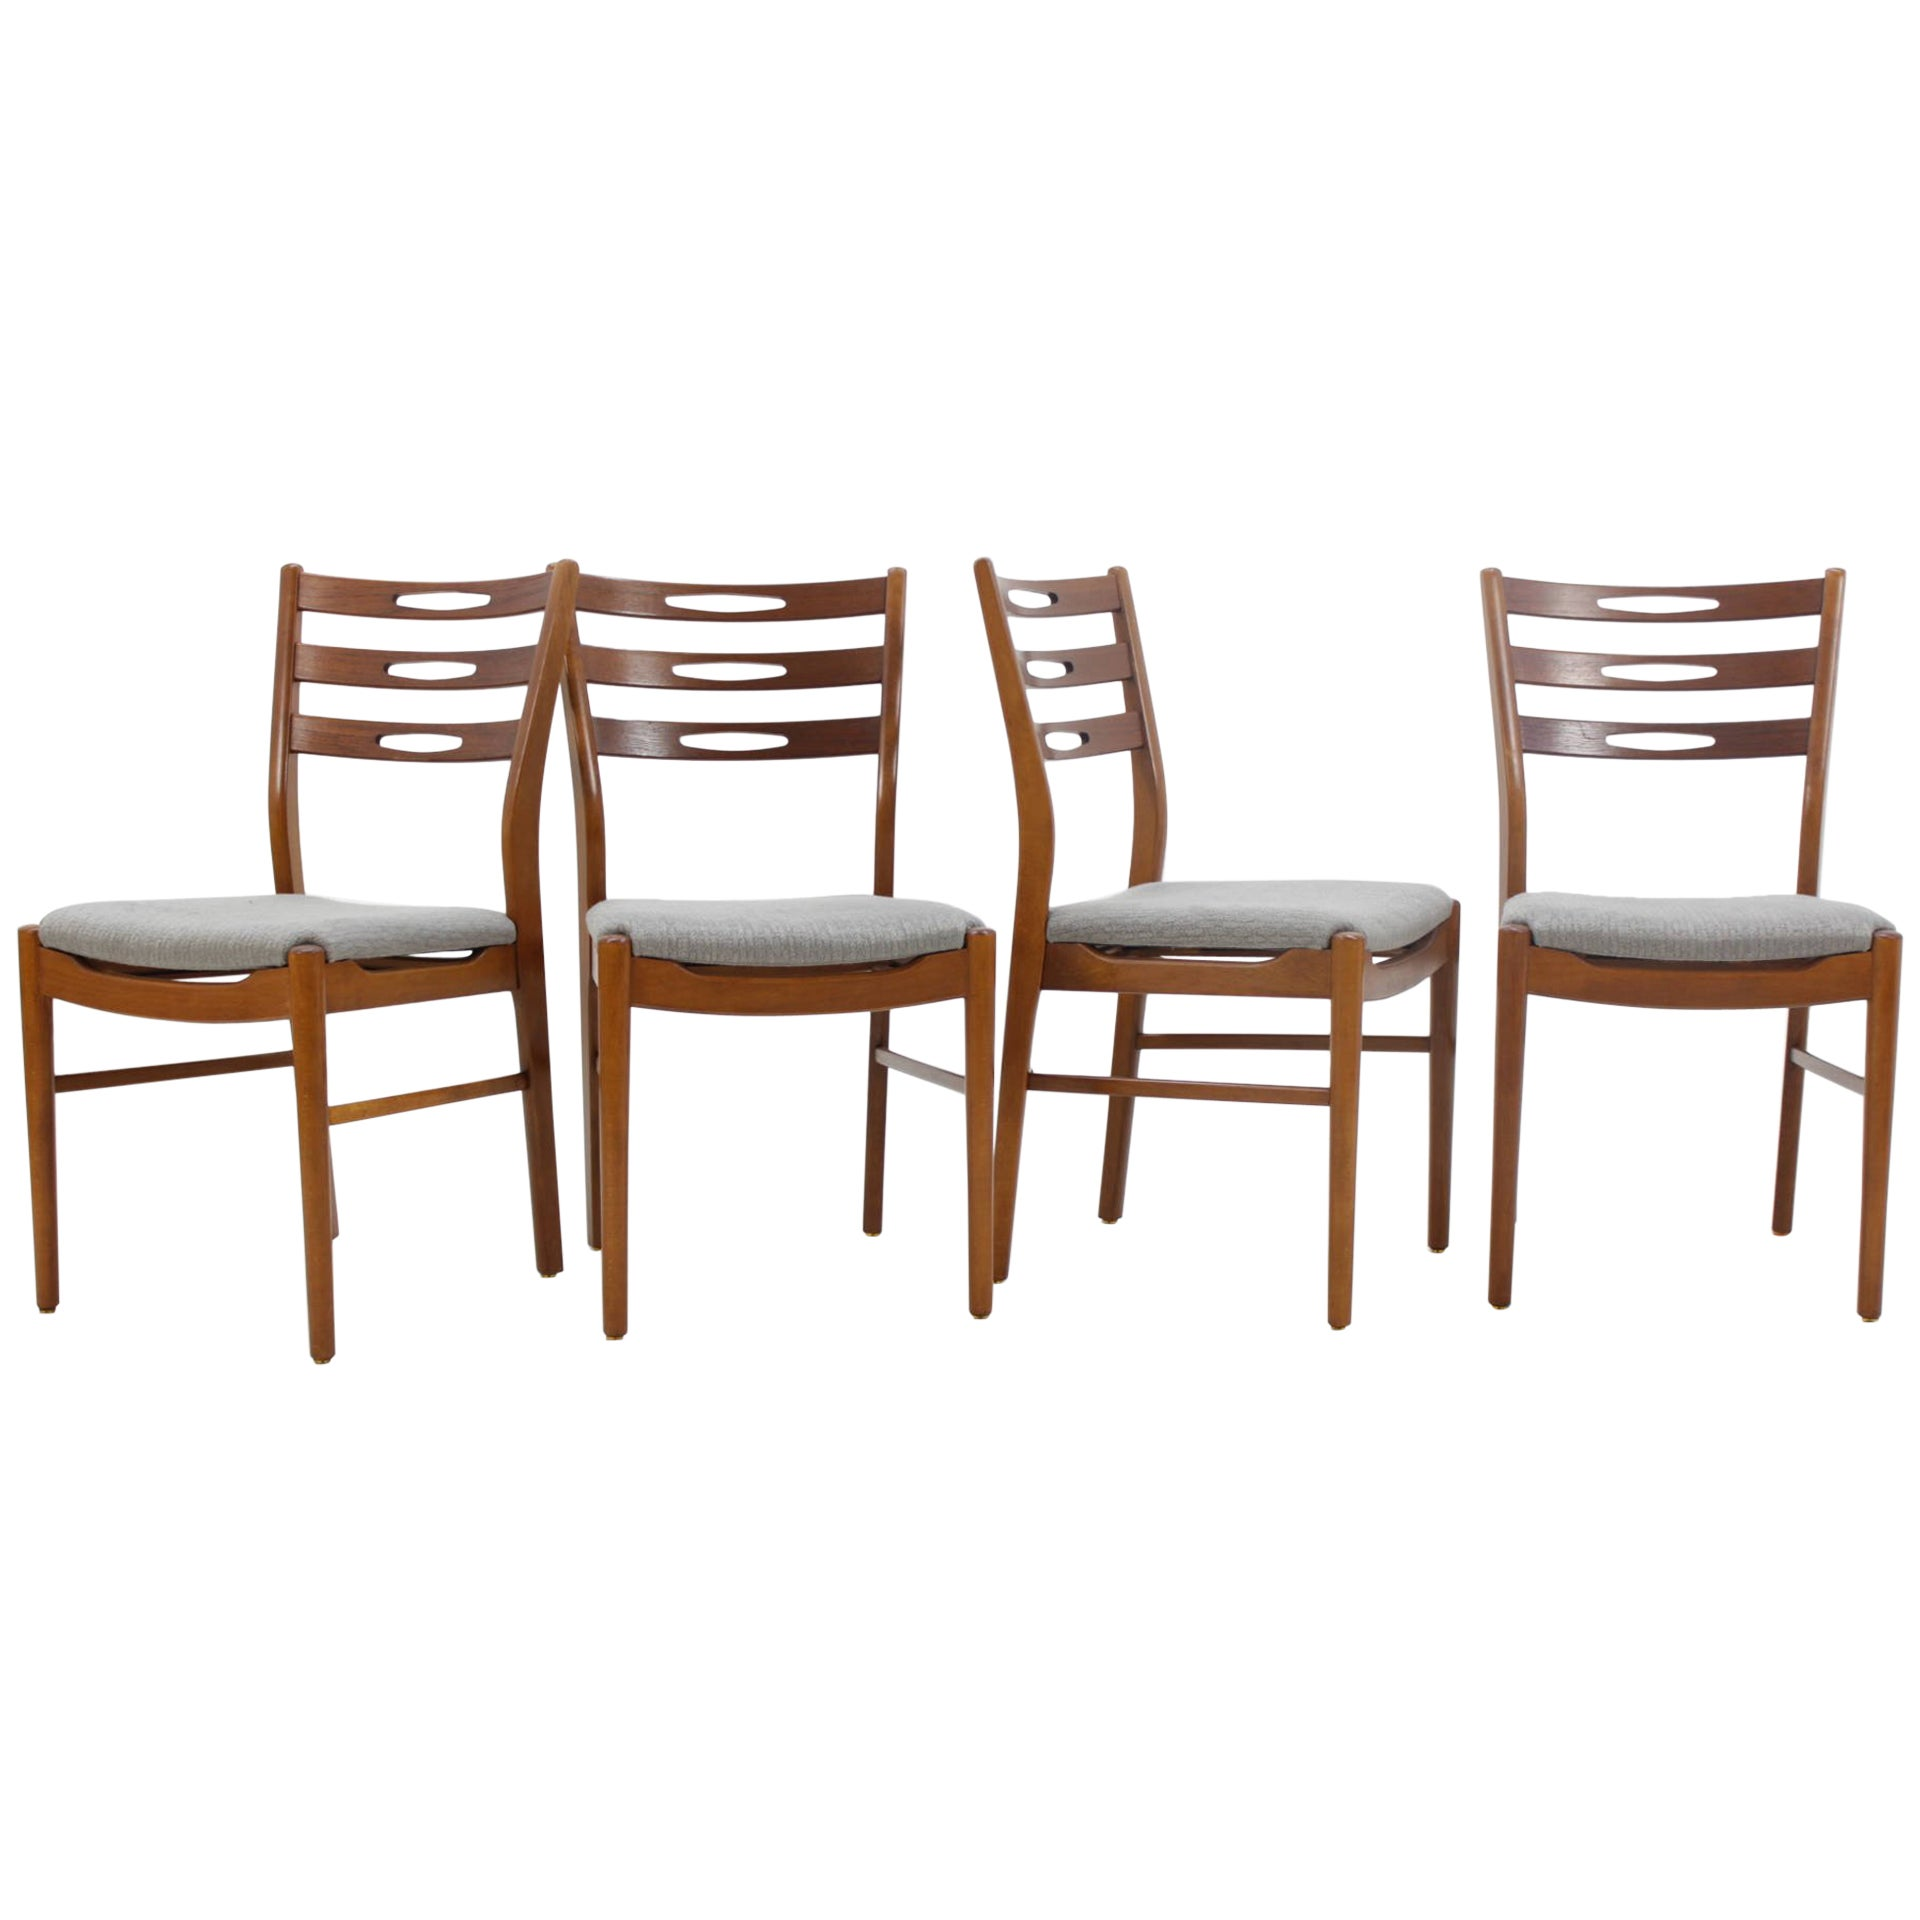 1960s Set of Four Danish Teak Chairs